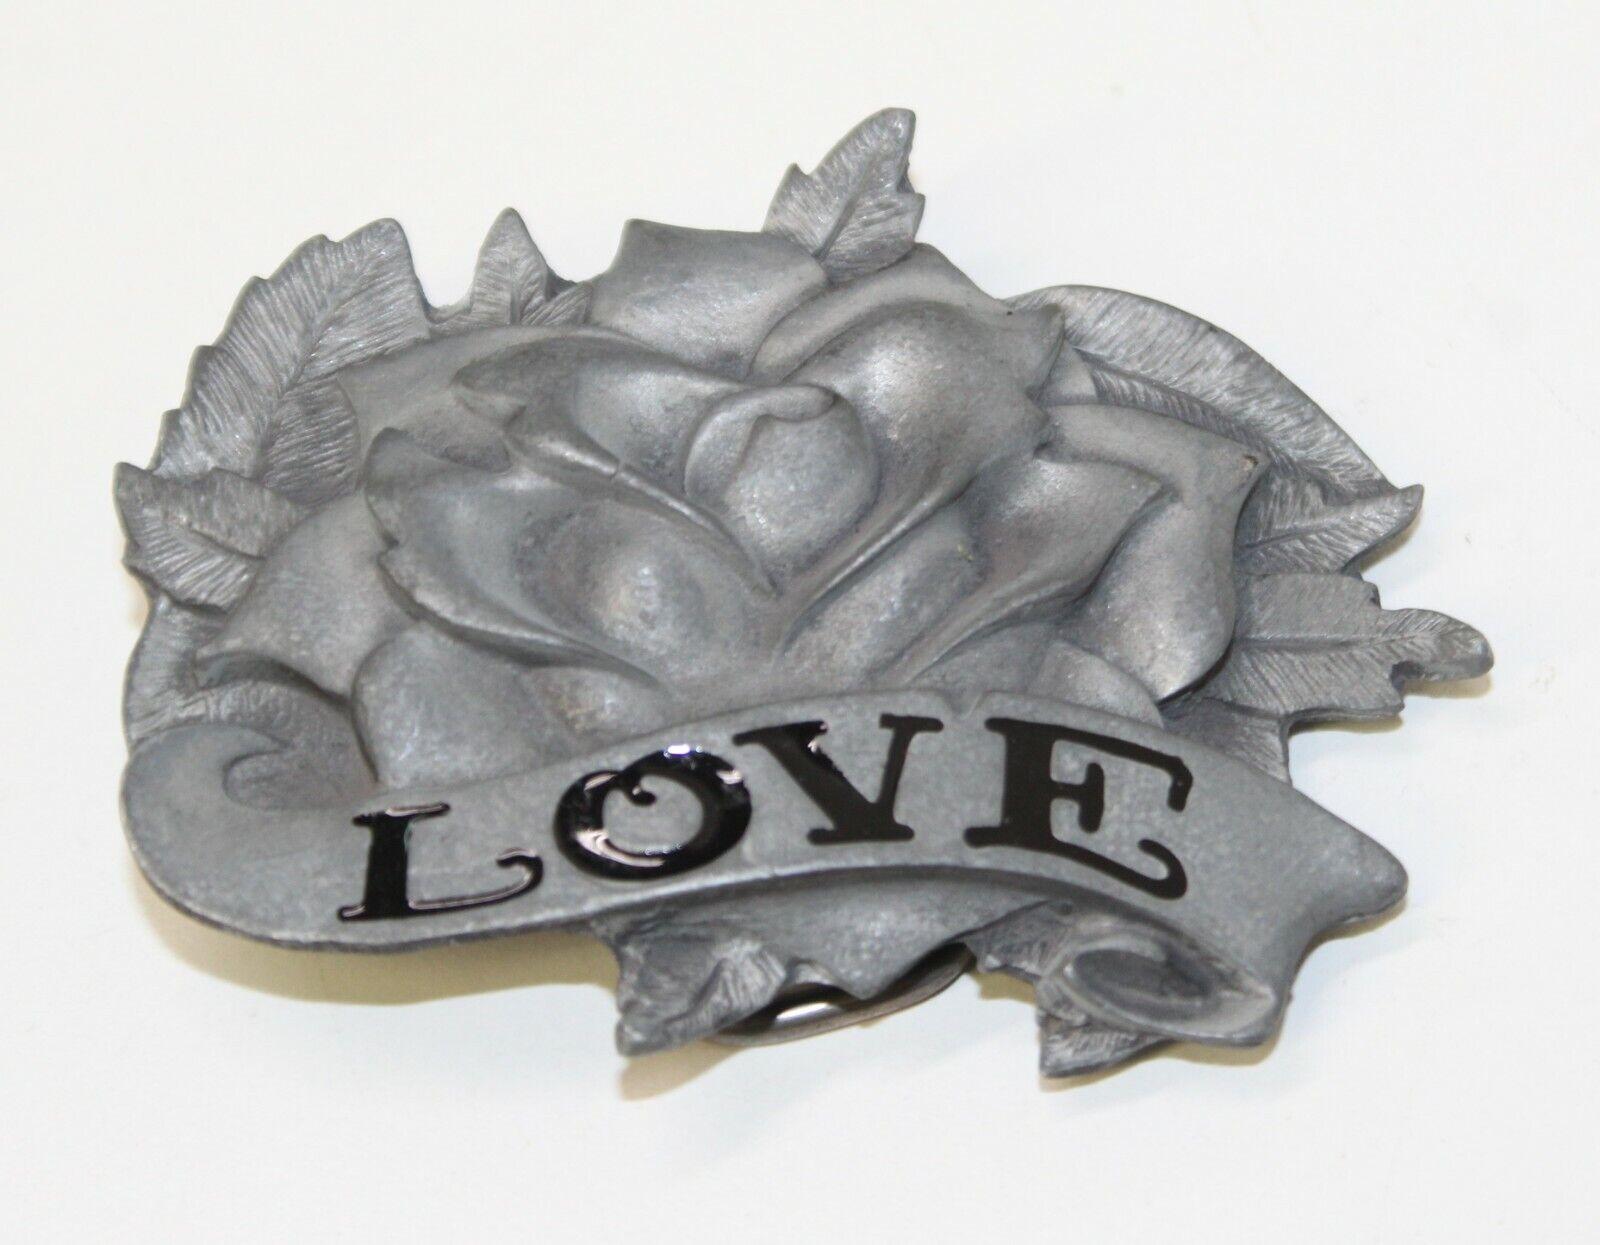 Heavy Metal Buckles Love Rose Metal Novelty Fashion Belt Buckle Free Shipping